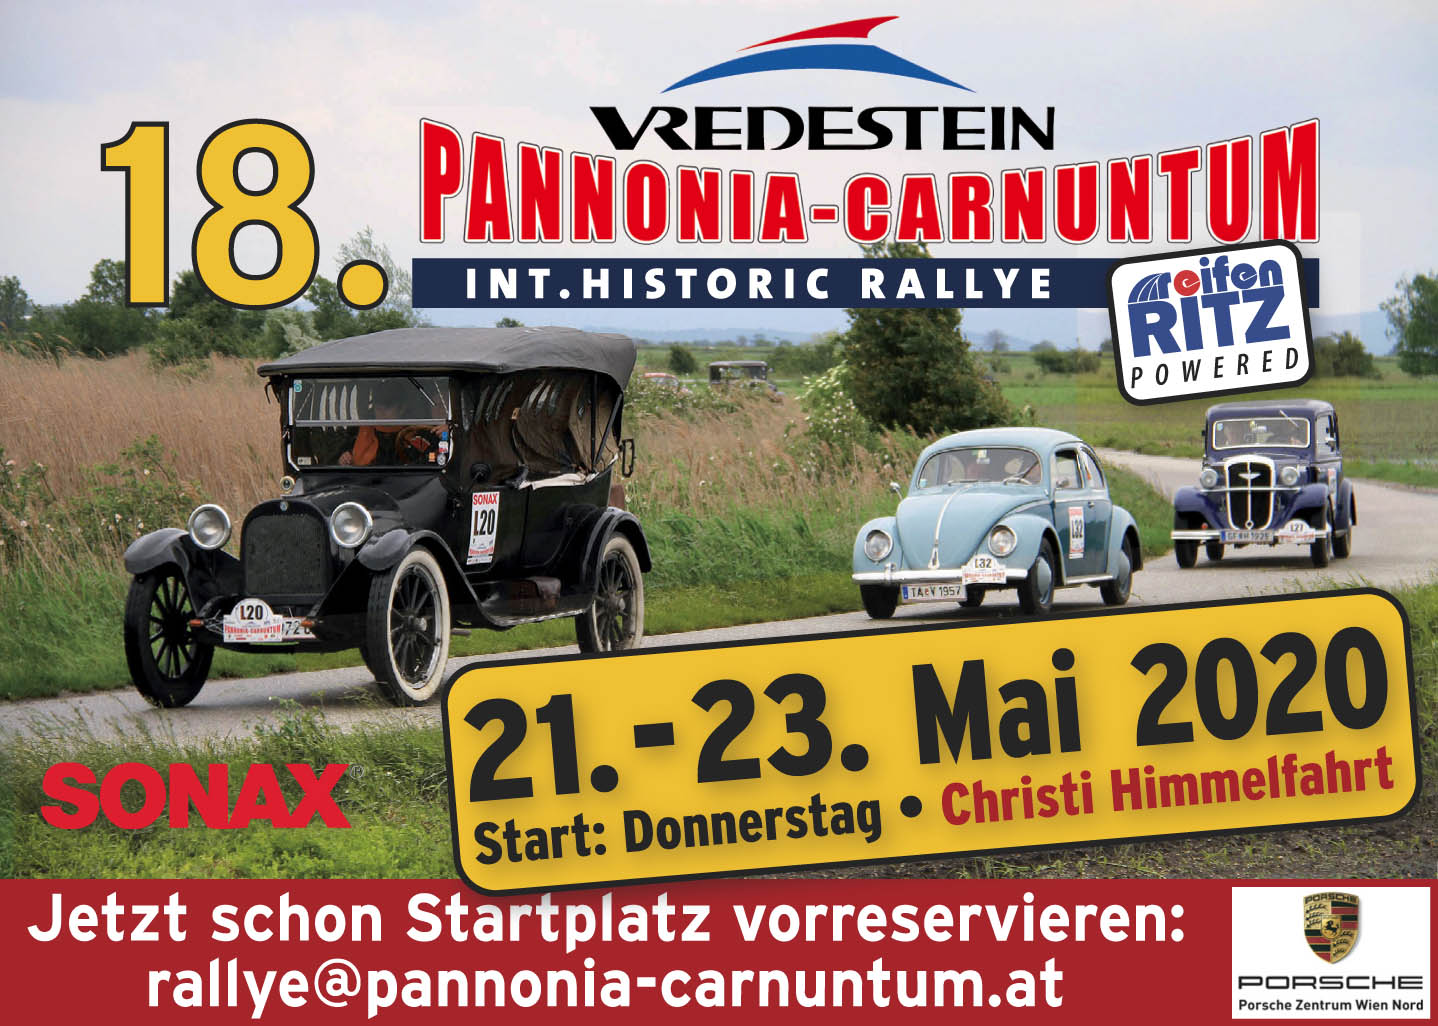 Pannonia-Carnuntum Rallye 2020